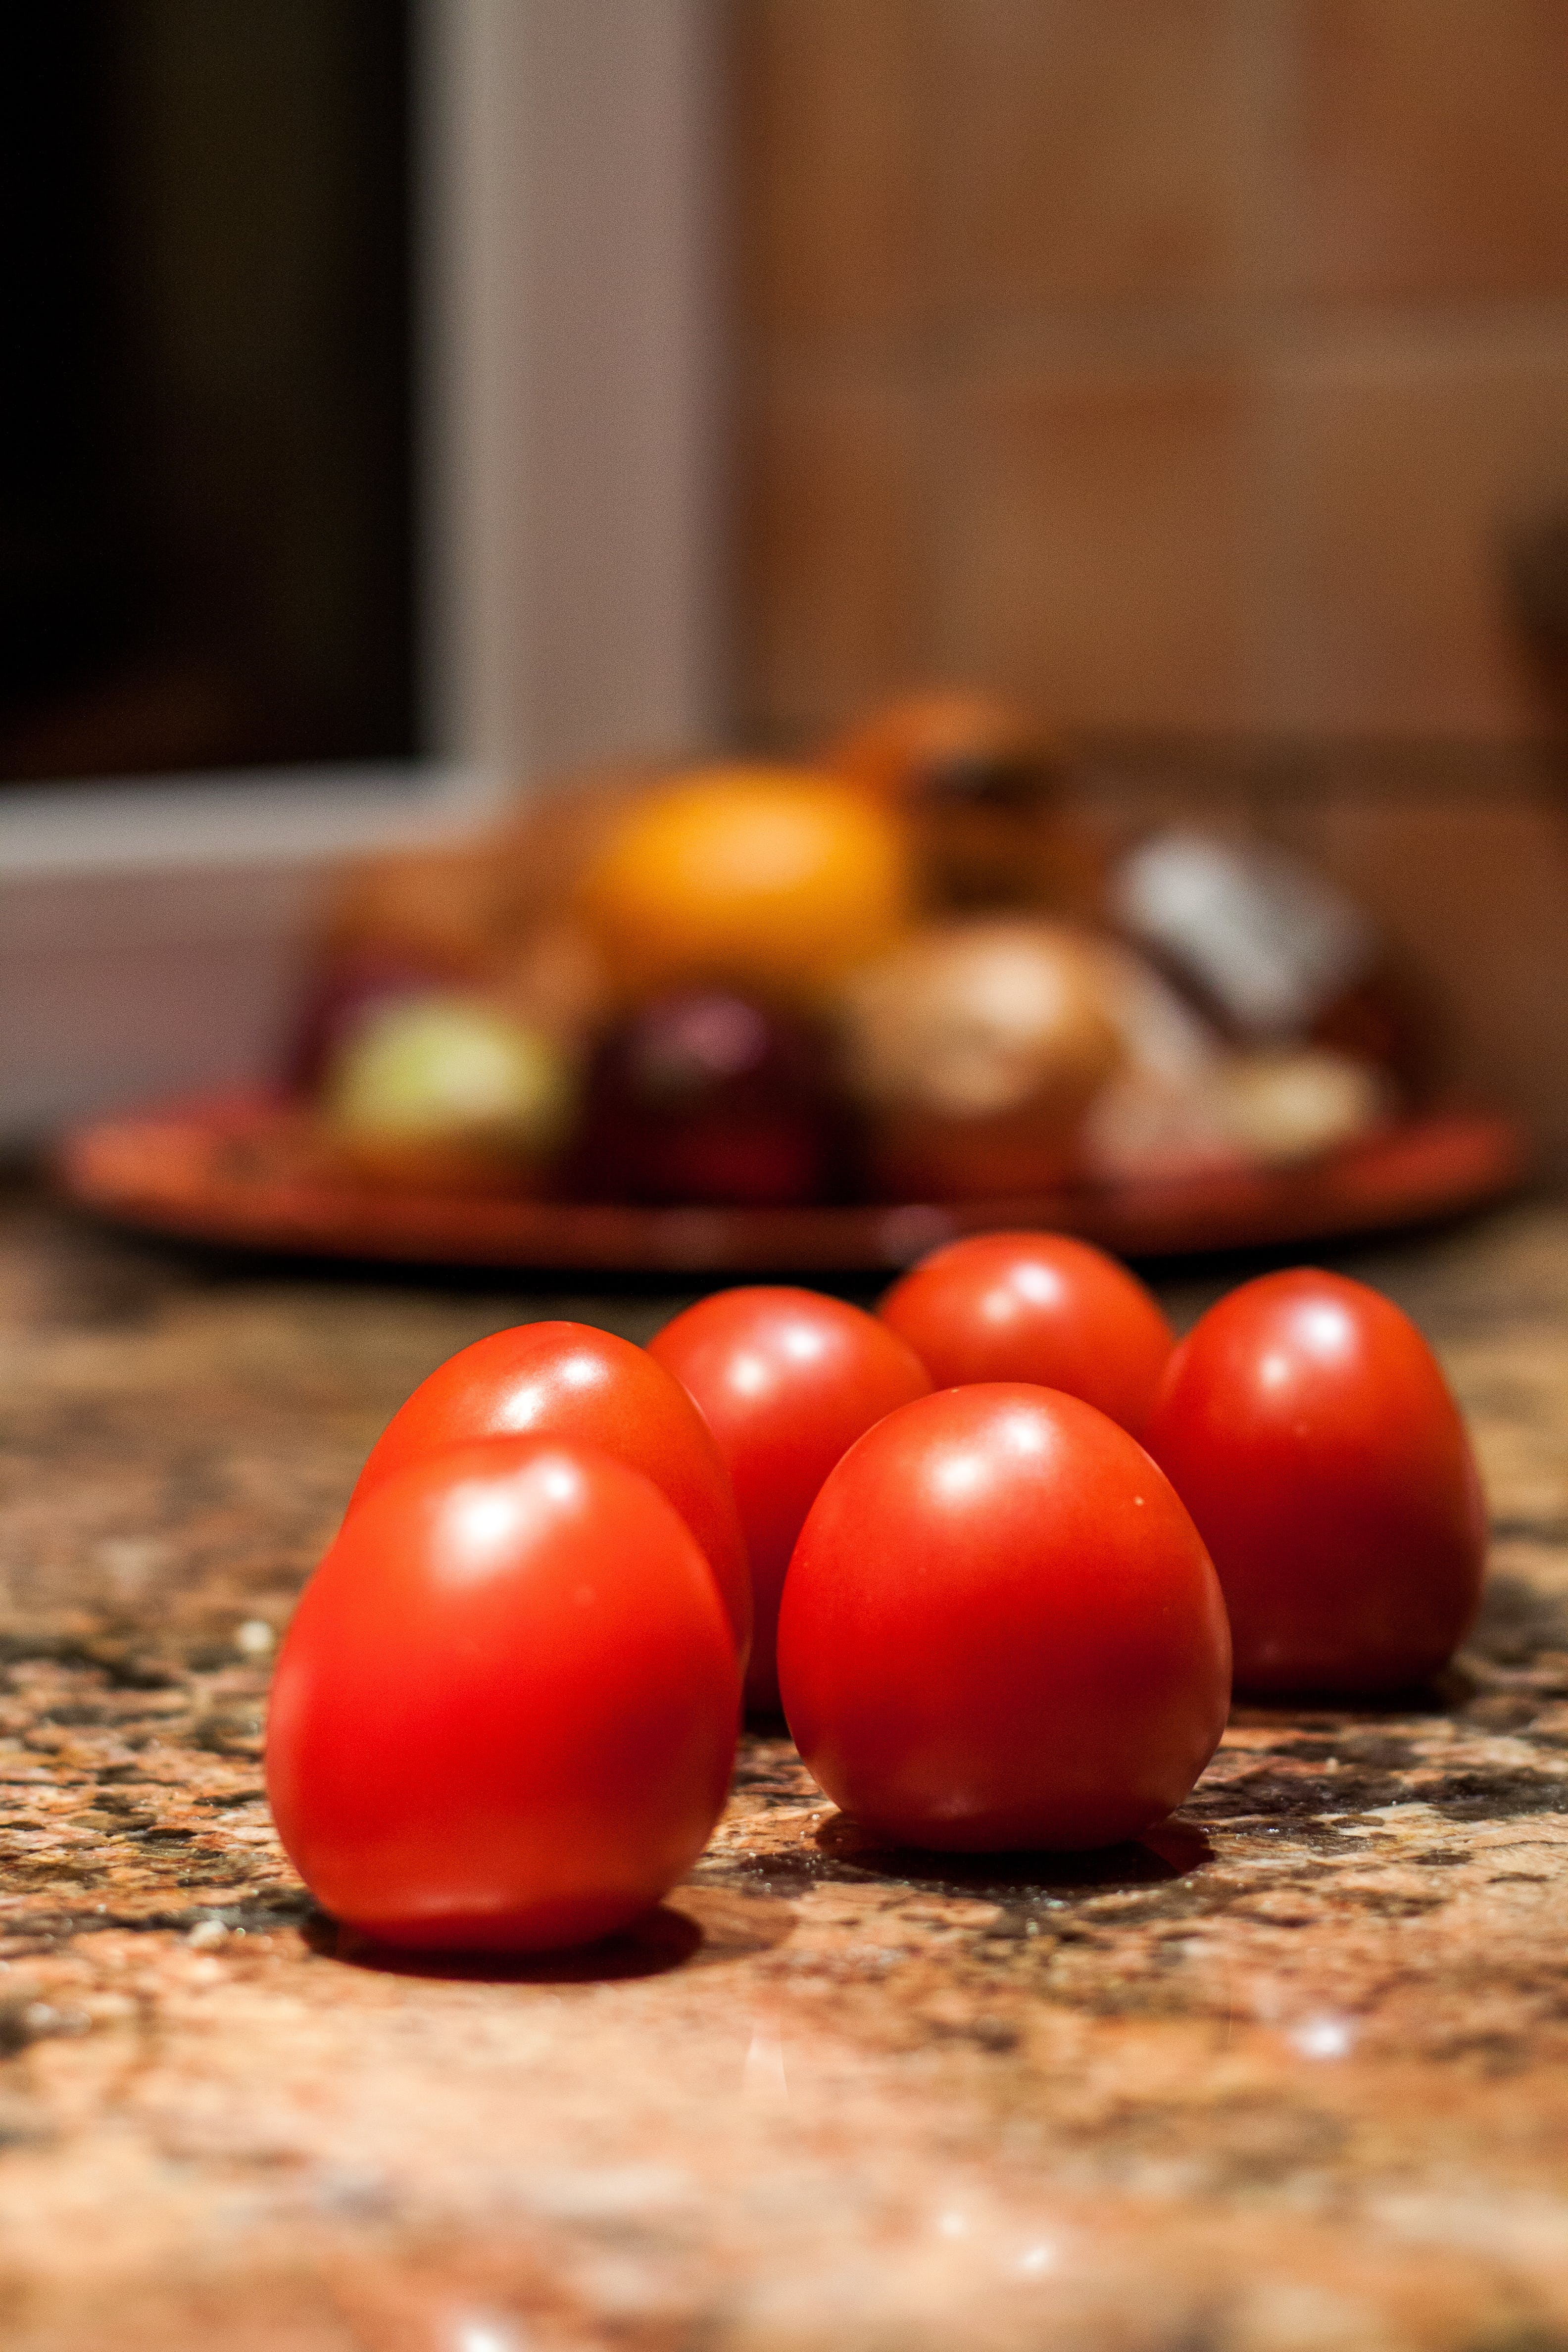 Free stock photo of food, red, kitchen, tomato